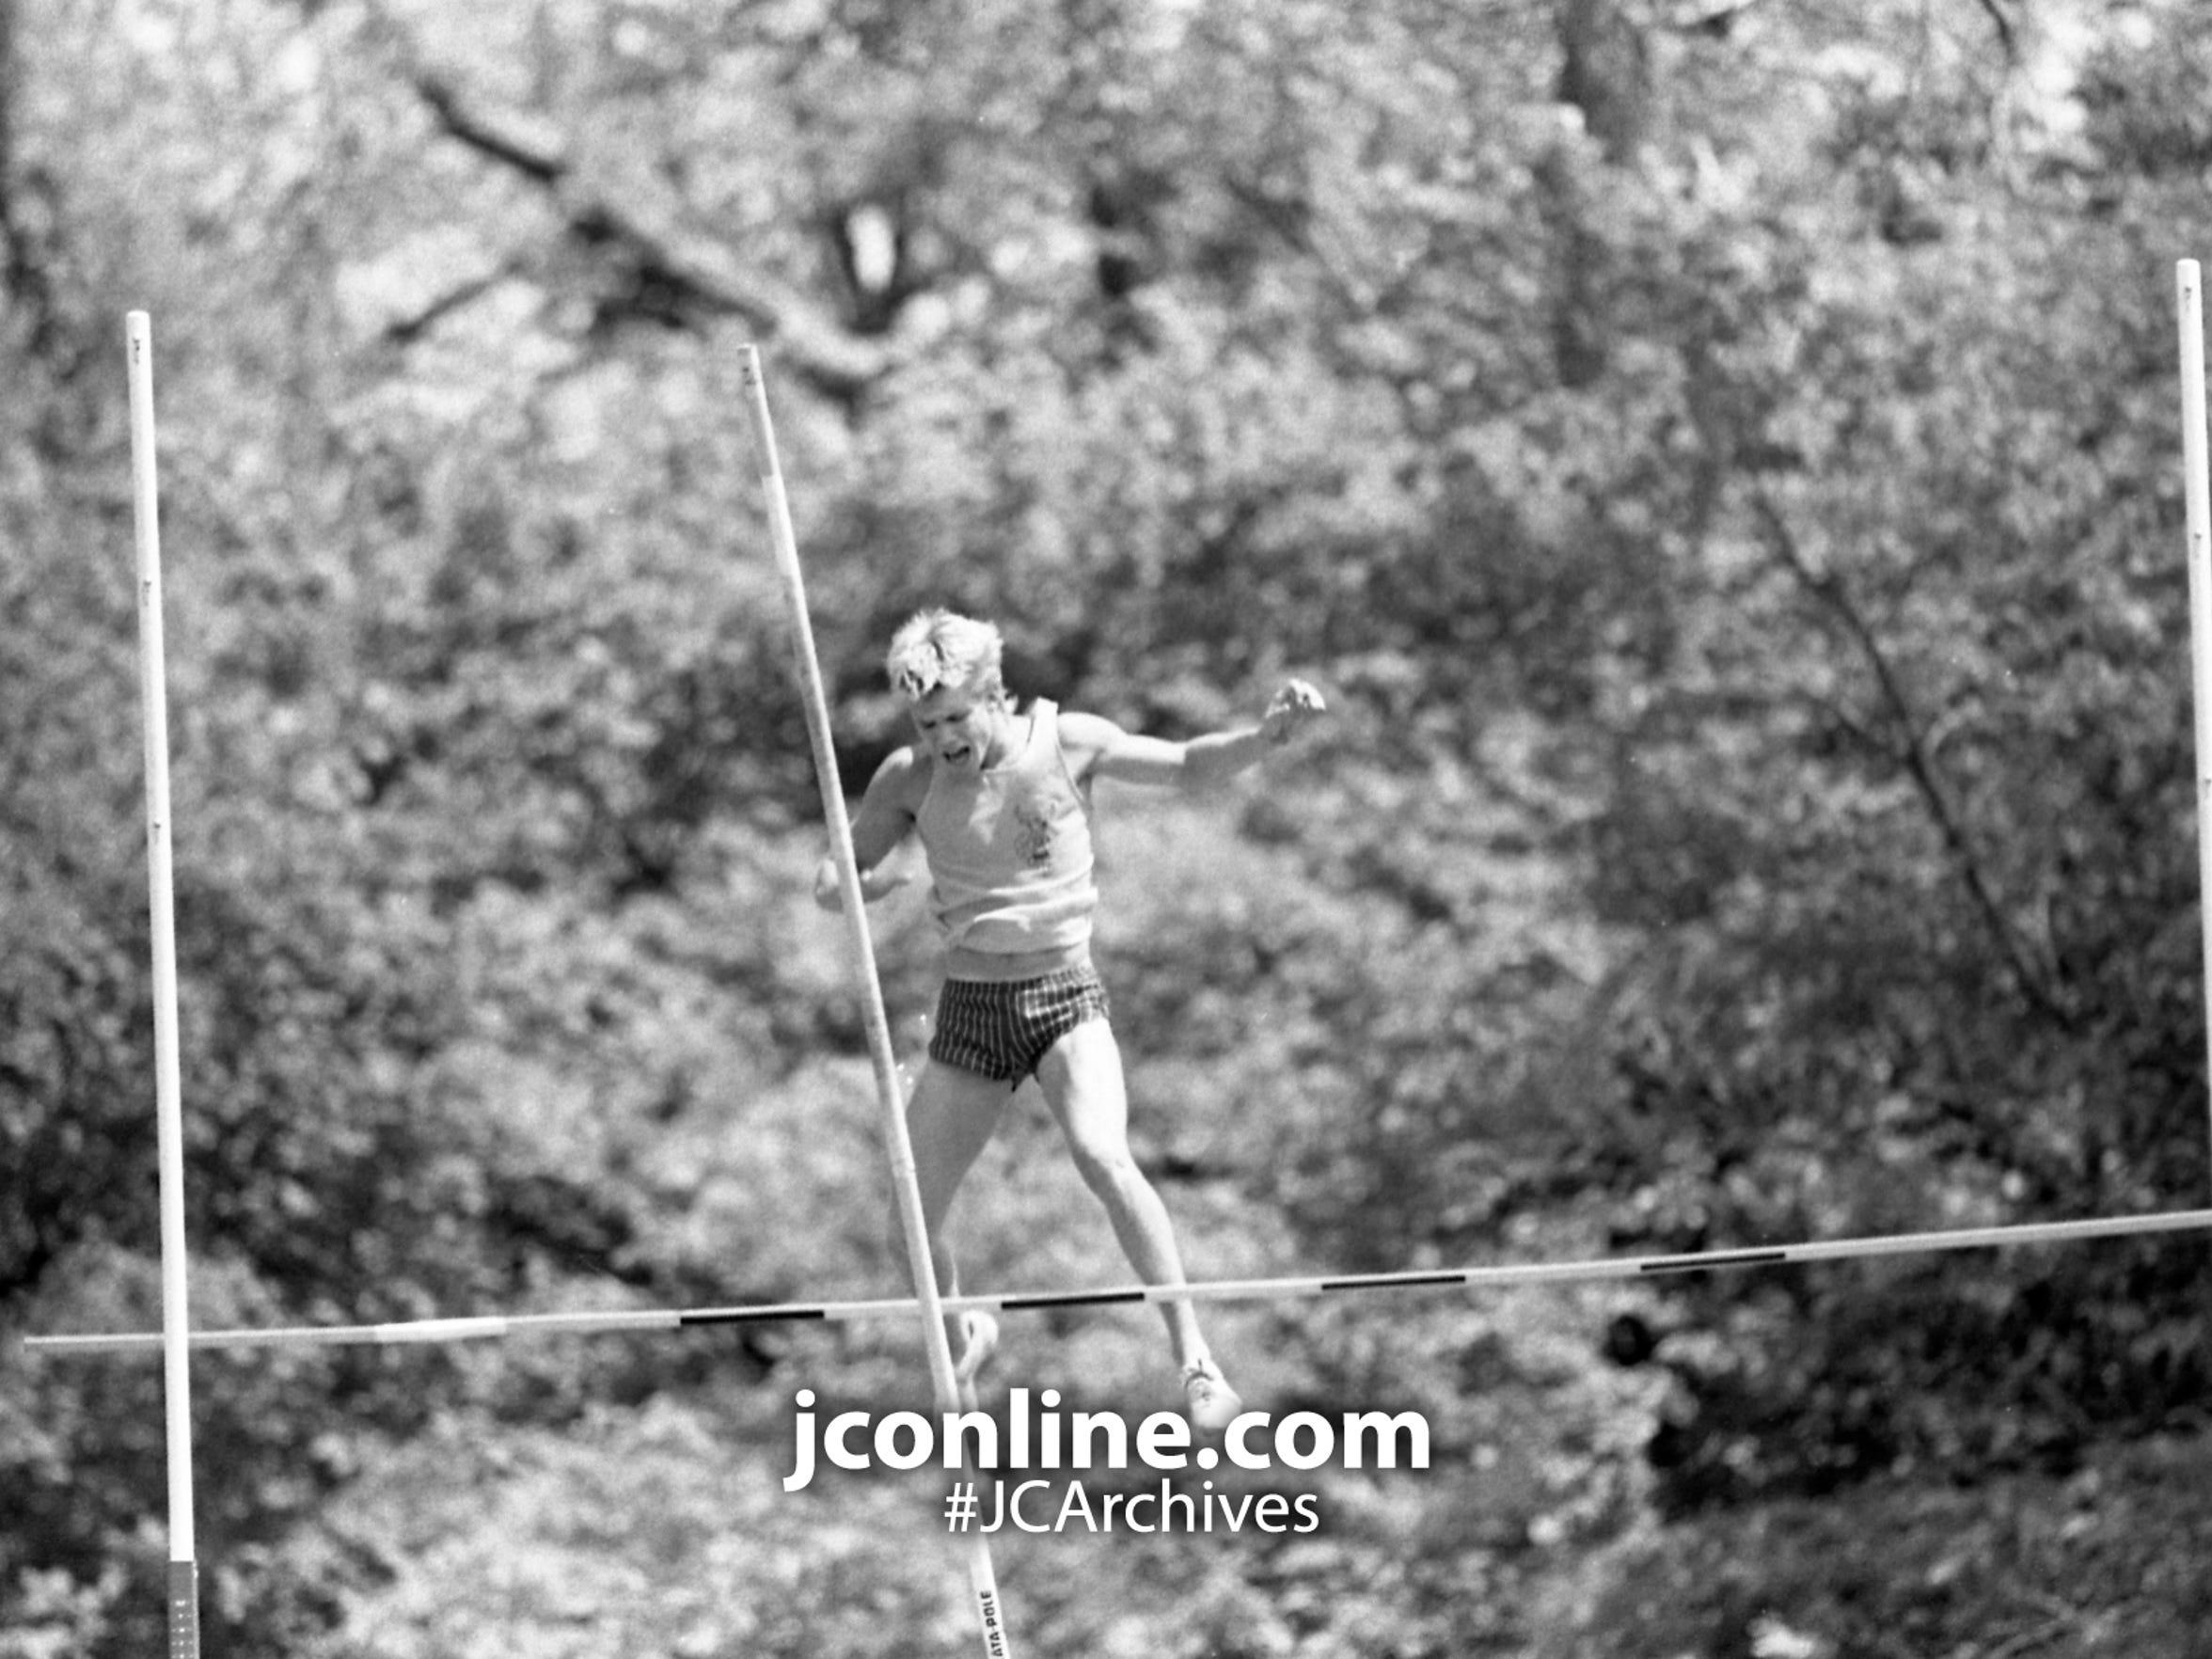 McCutcheon's Shannon Hoon misses the mark at 13 feet